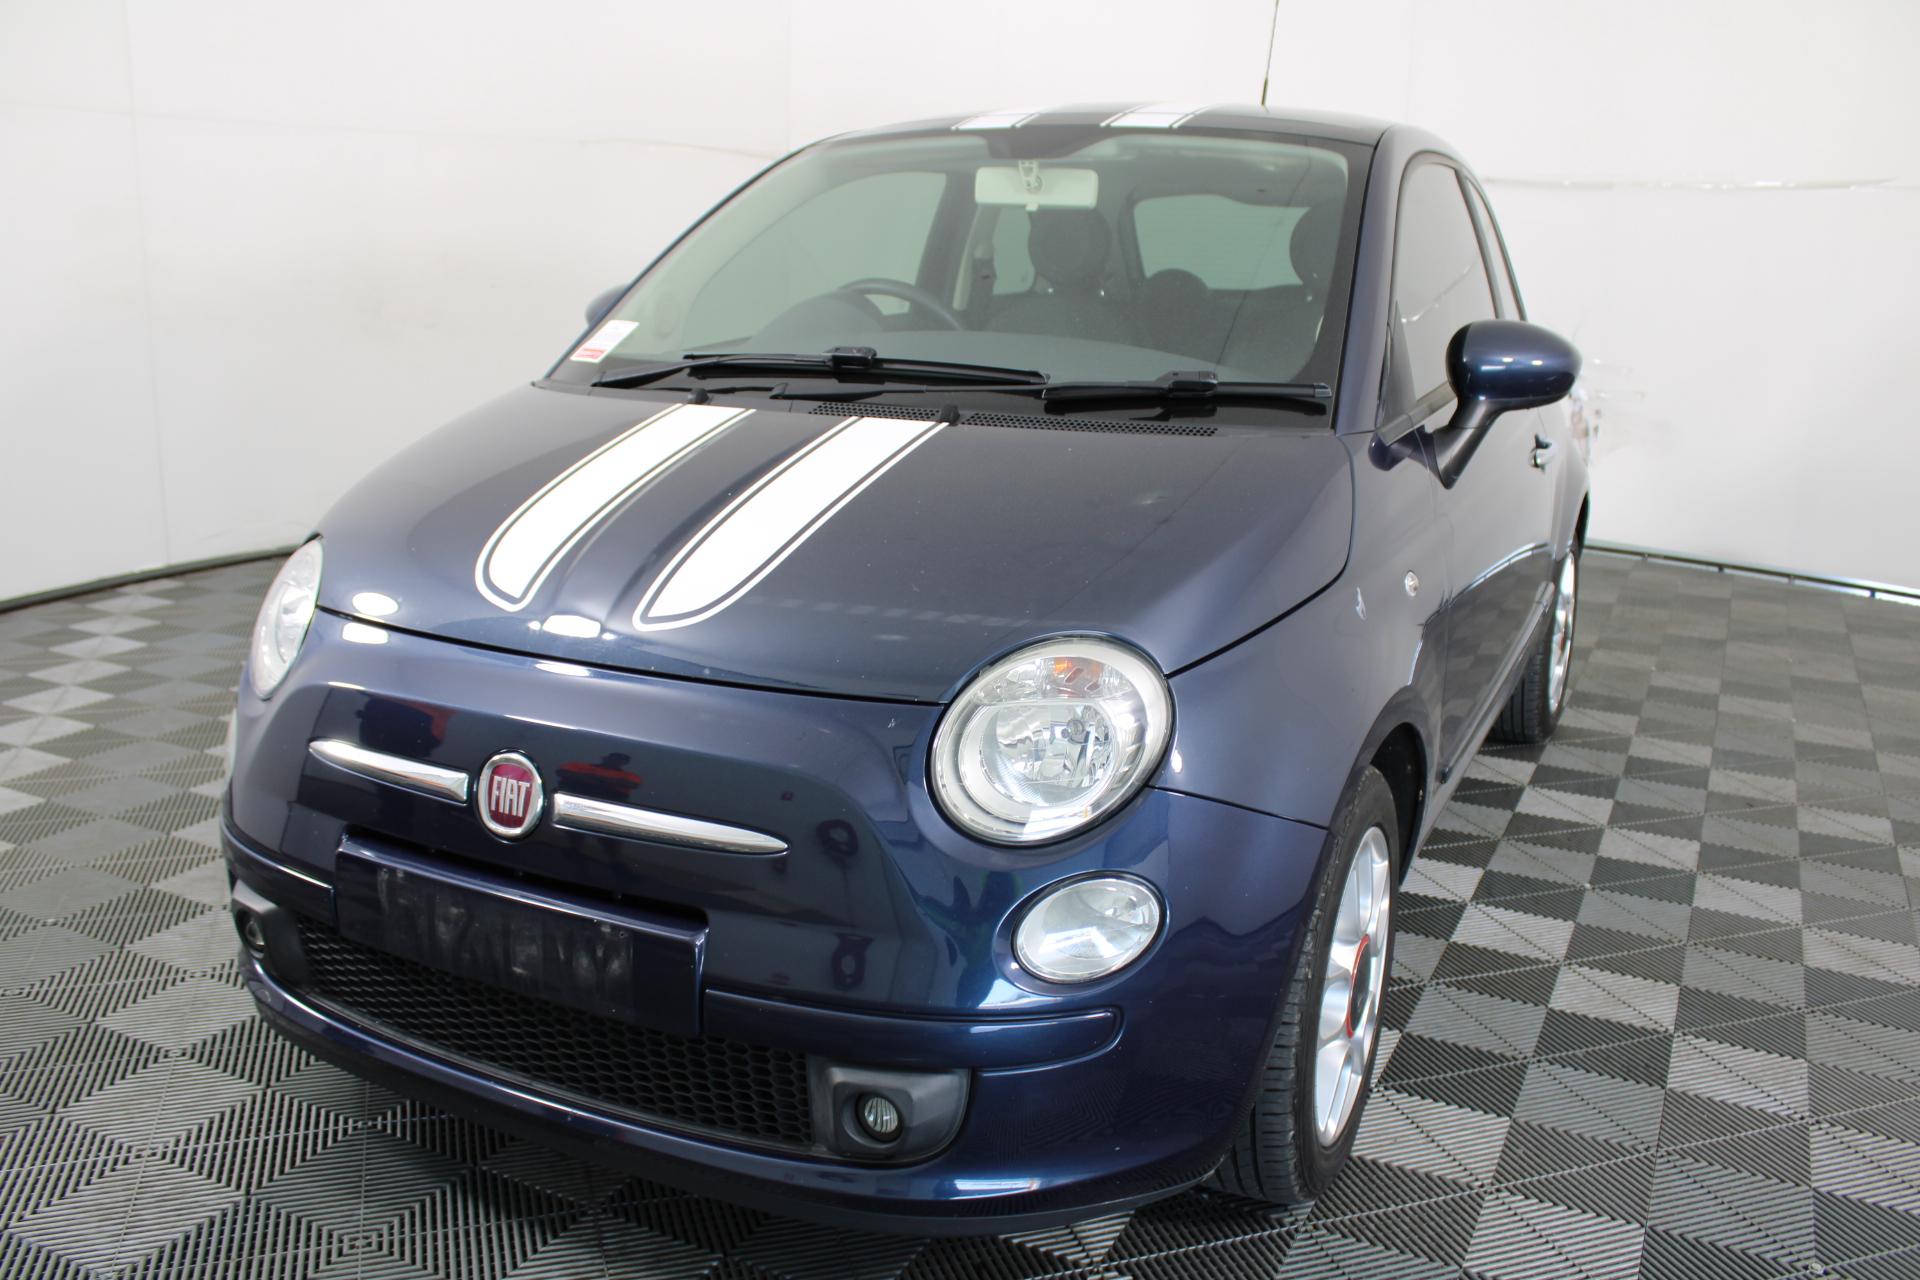 2008 (2009) Fiat 500 POP Hatchback 68,878km